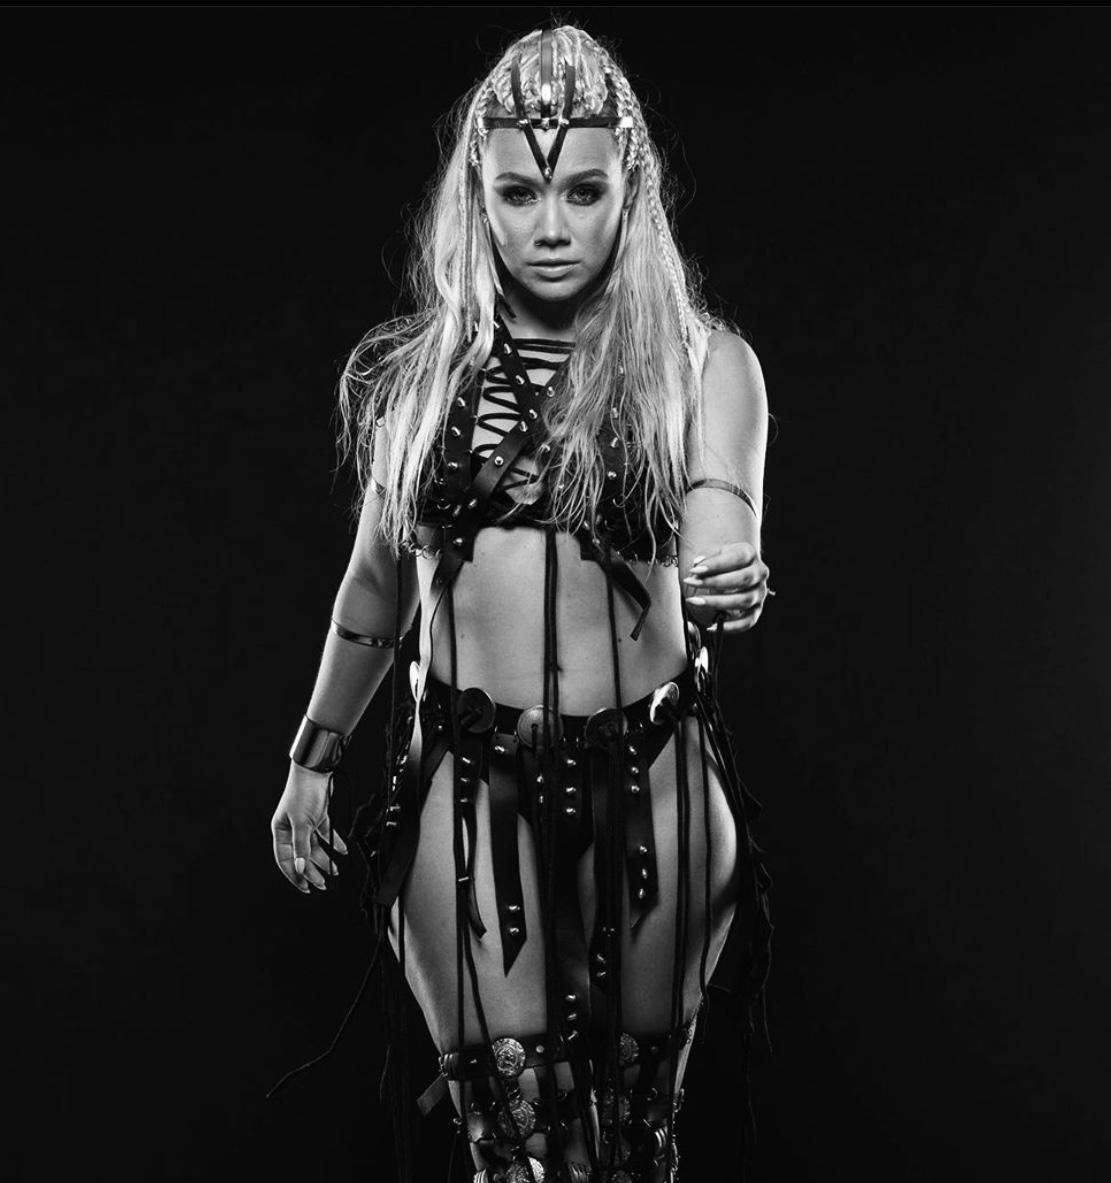 https://danceprestige.ro/wp-content/uploads/2019/10/SIMONA-MEREU.jpg